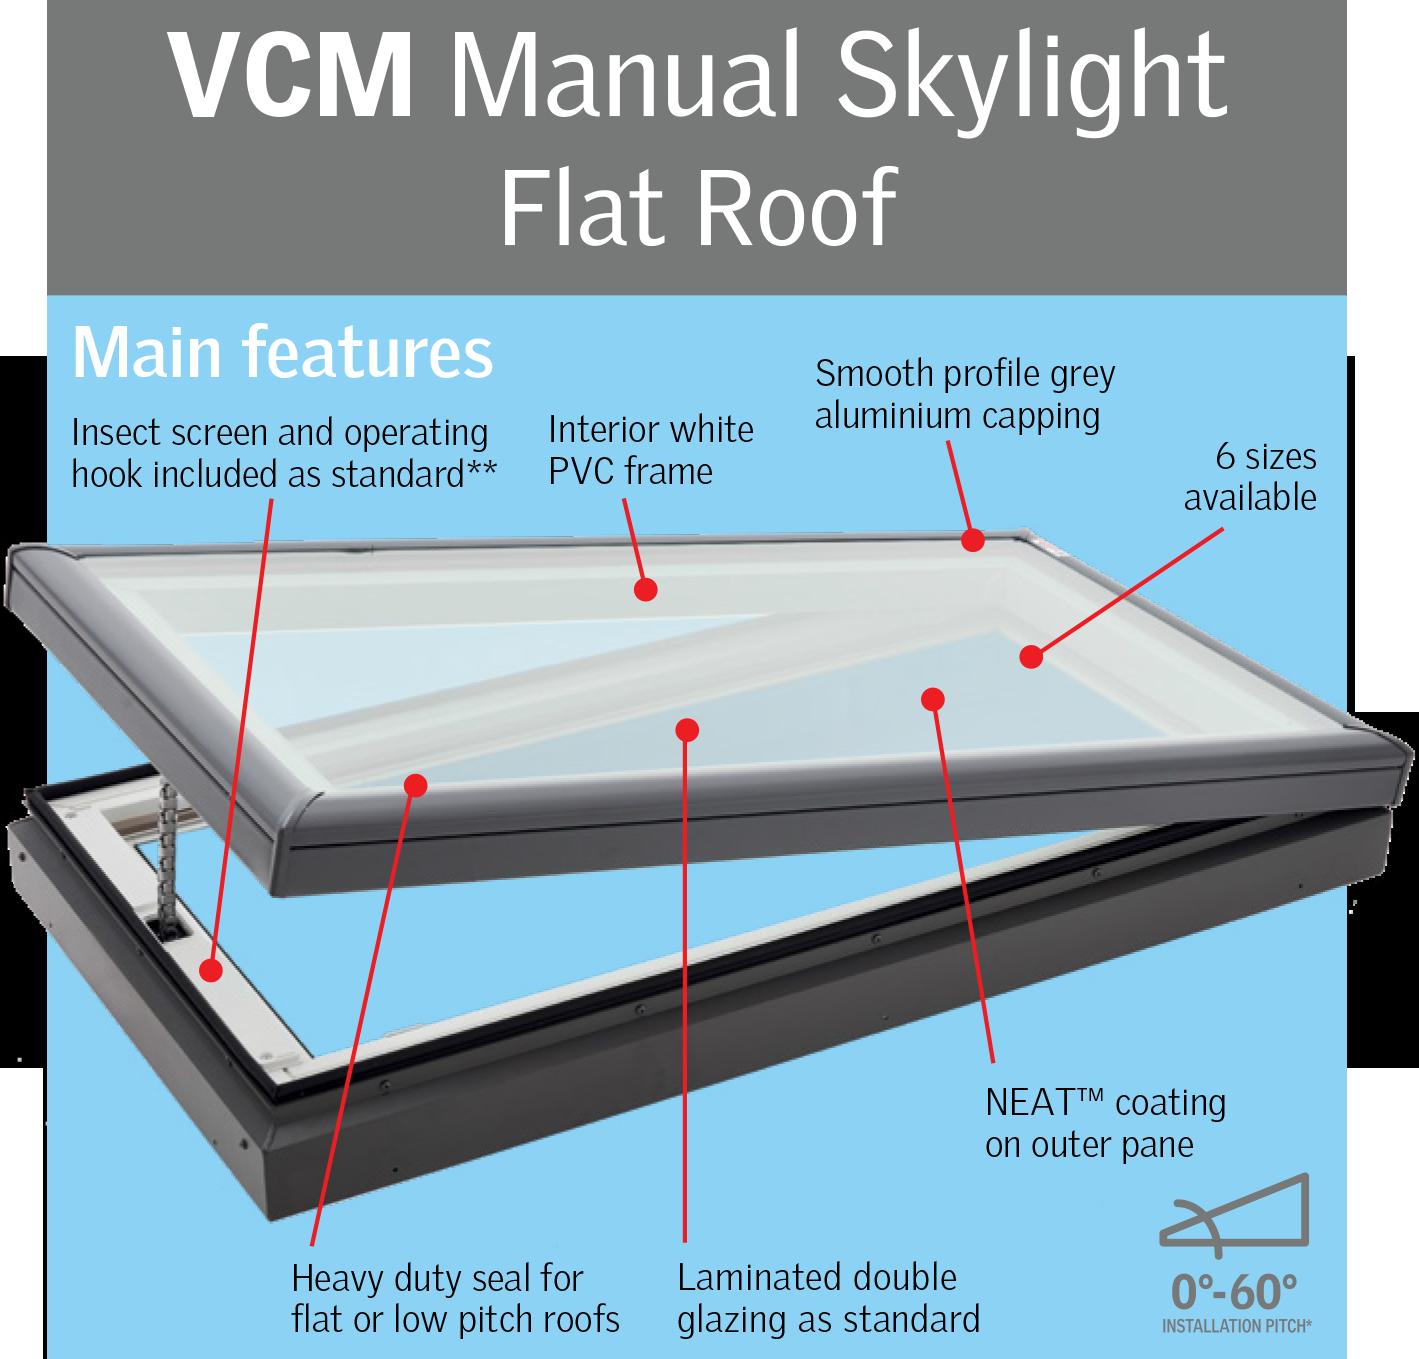 VCM-Manual-Skylight-Flat-Roof